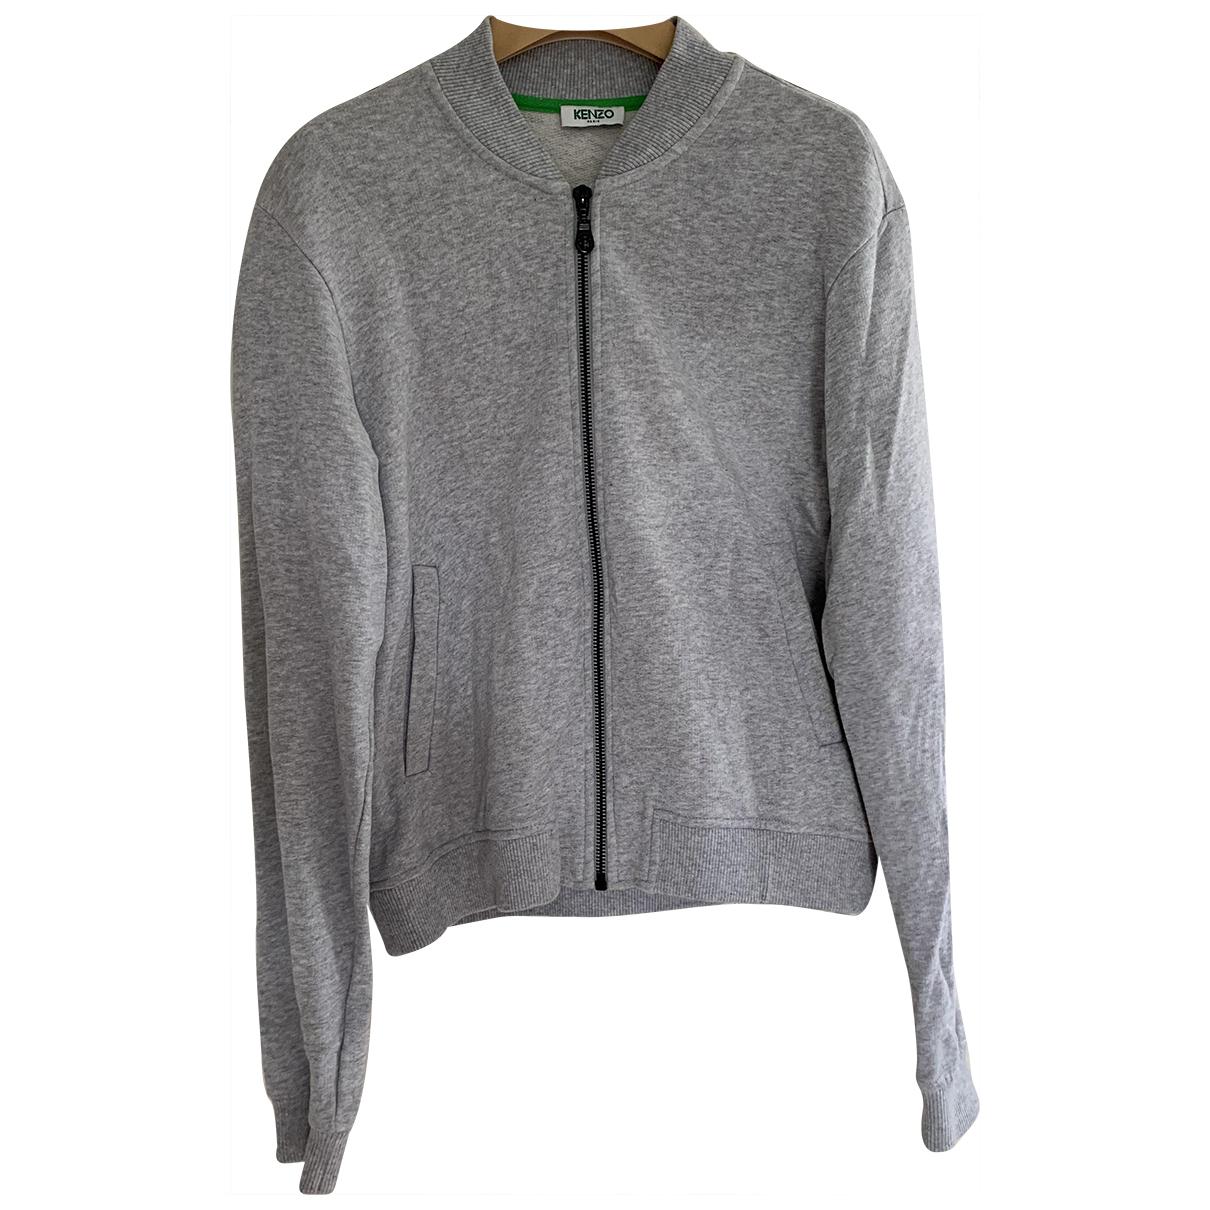 Kenzo \N Grey Cotton jacket for Women 36 FR